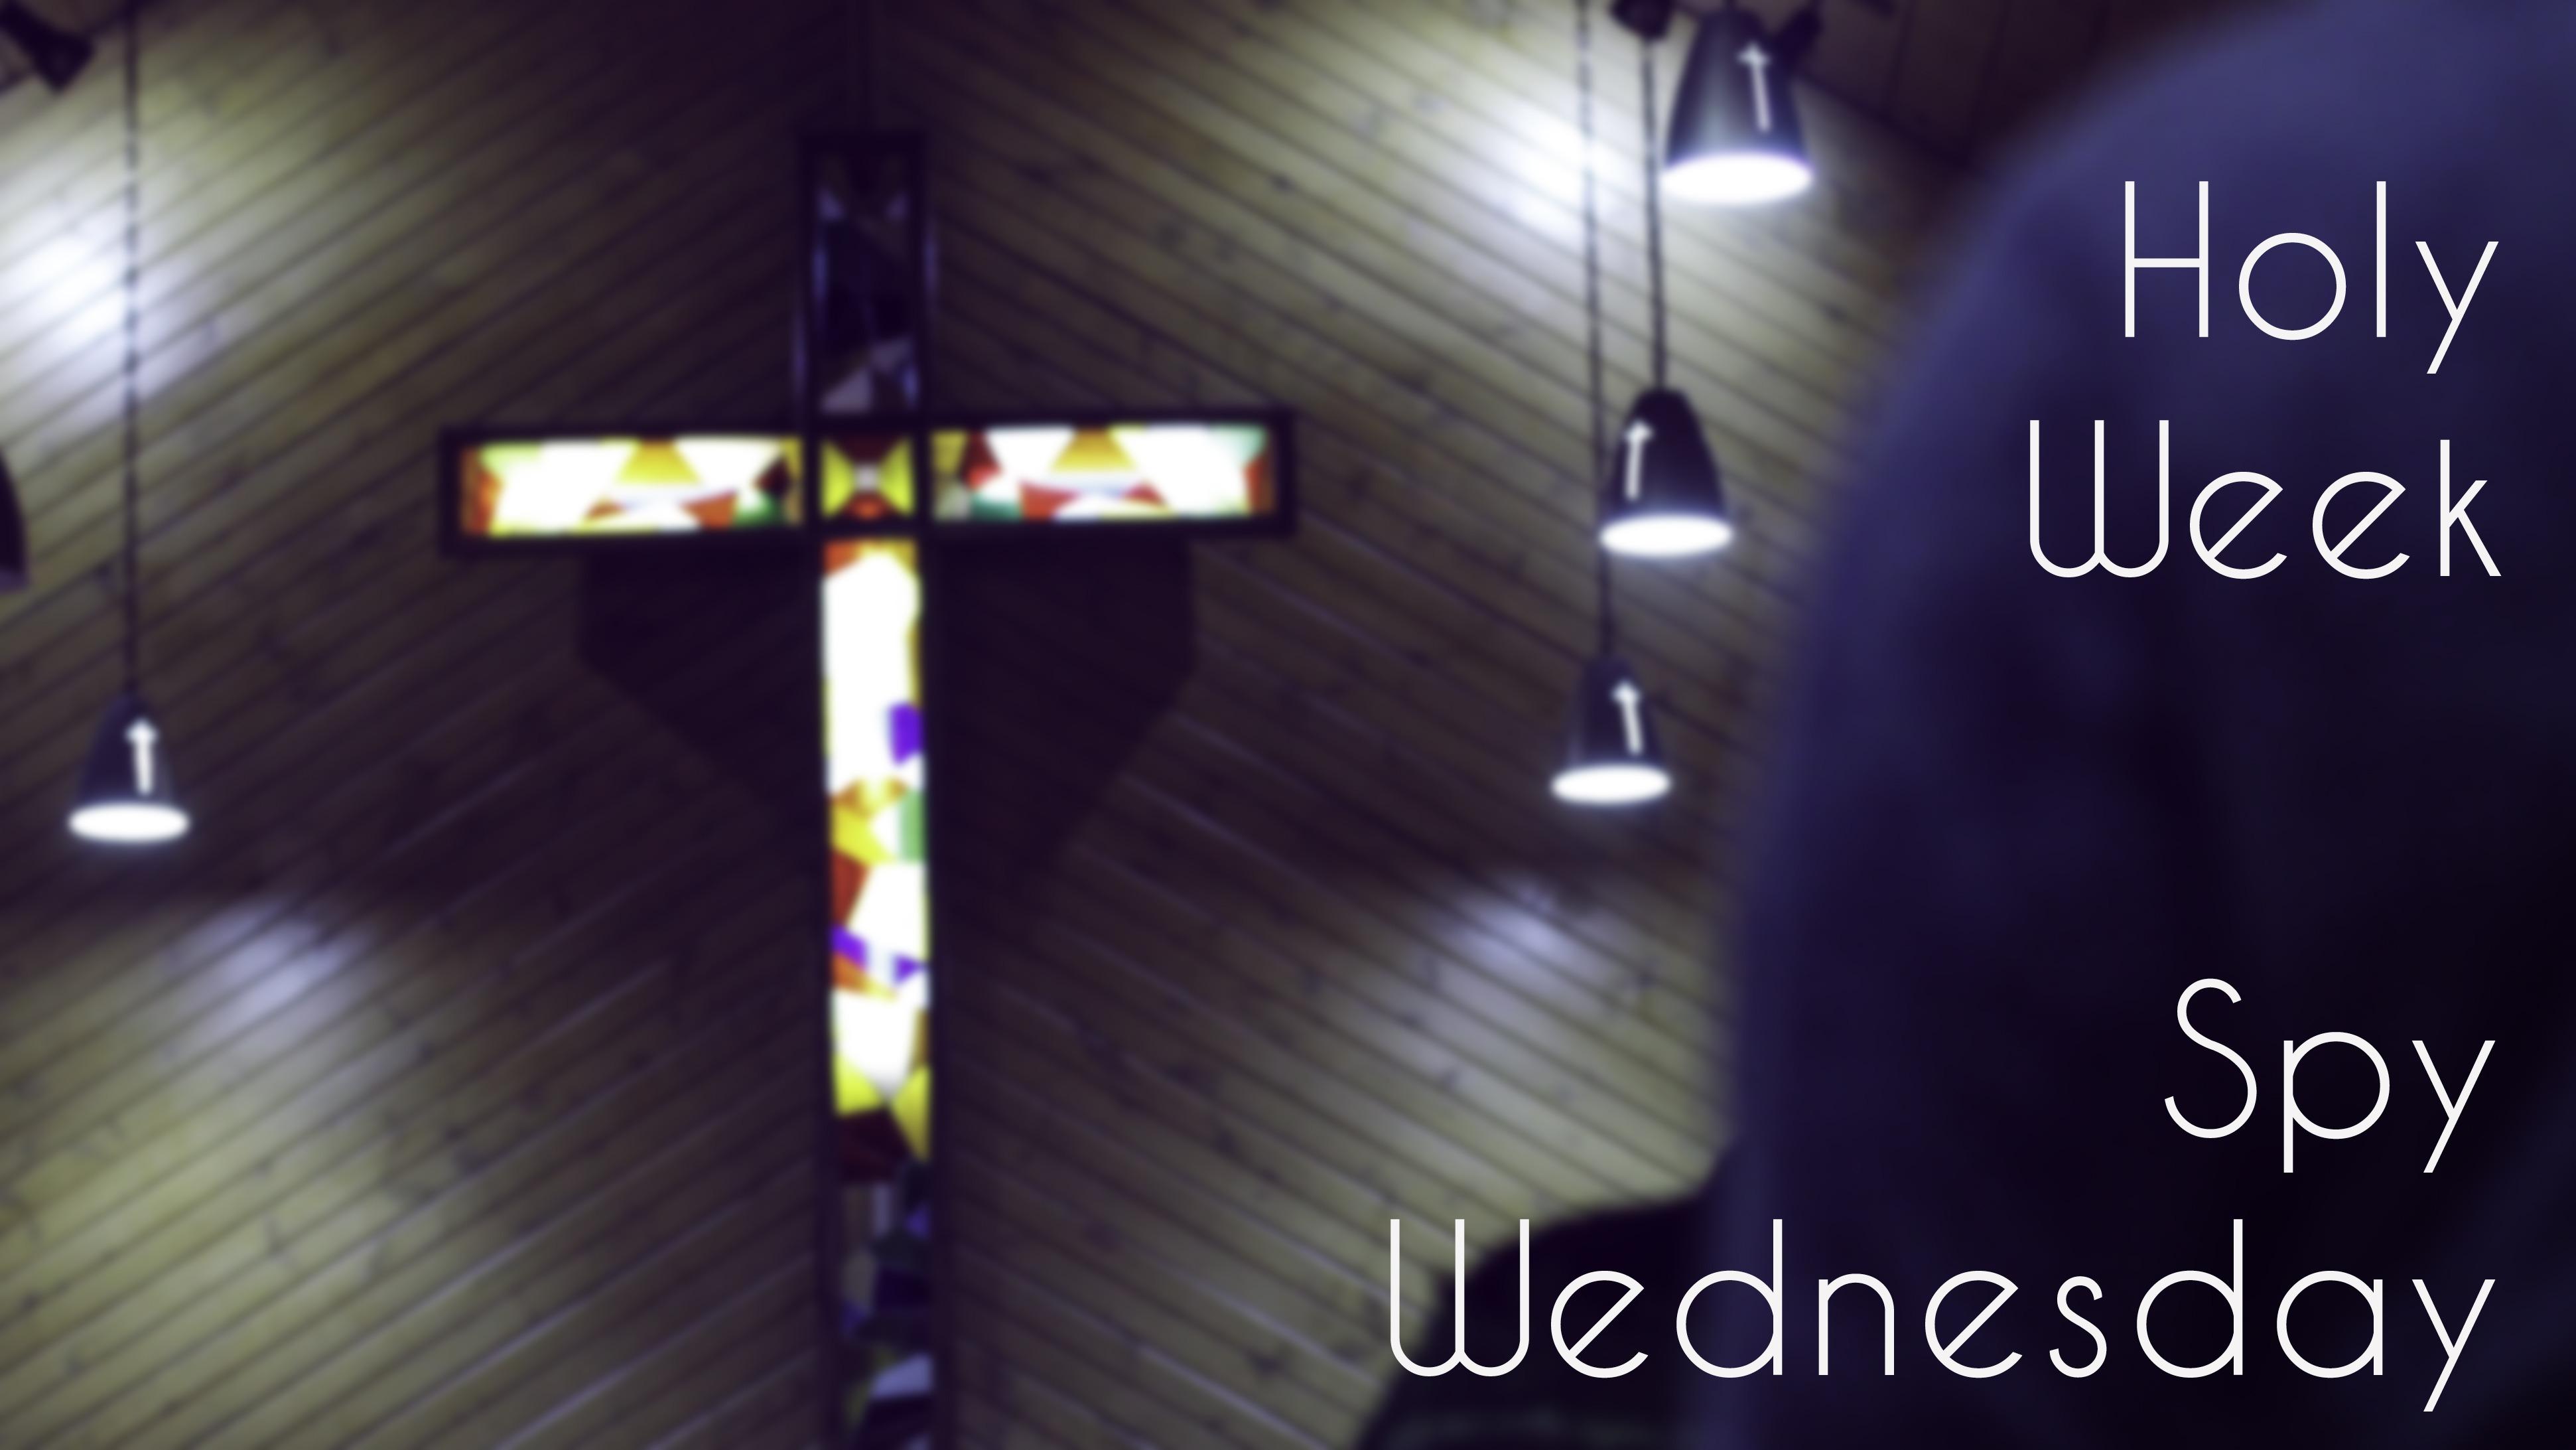 Holy Wednesday